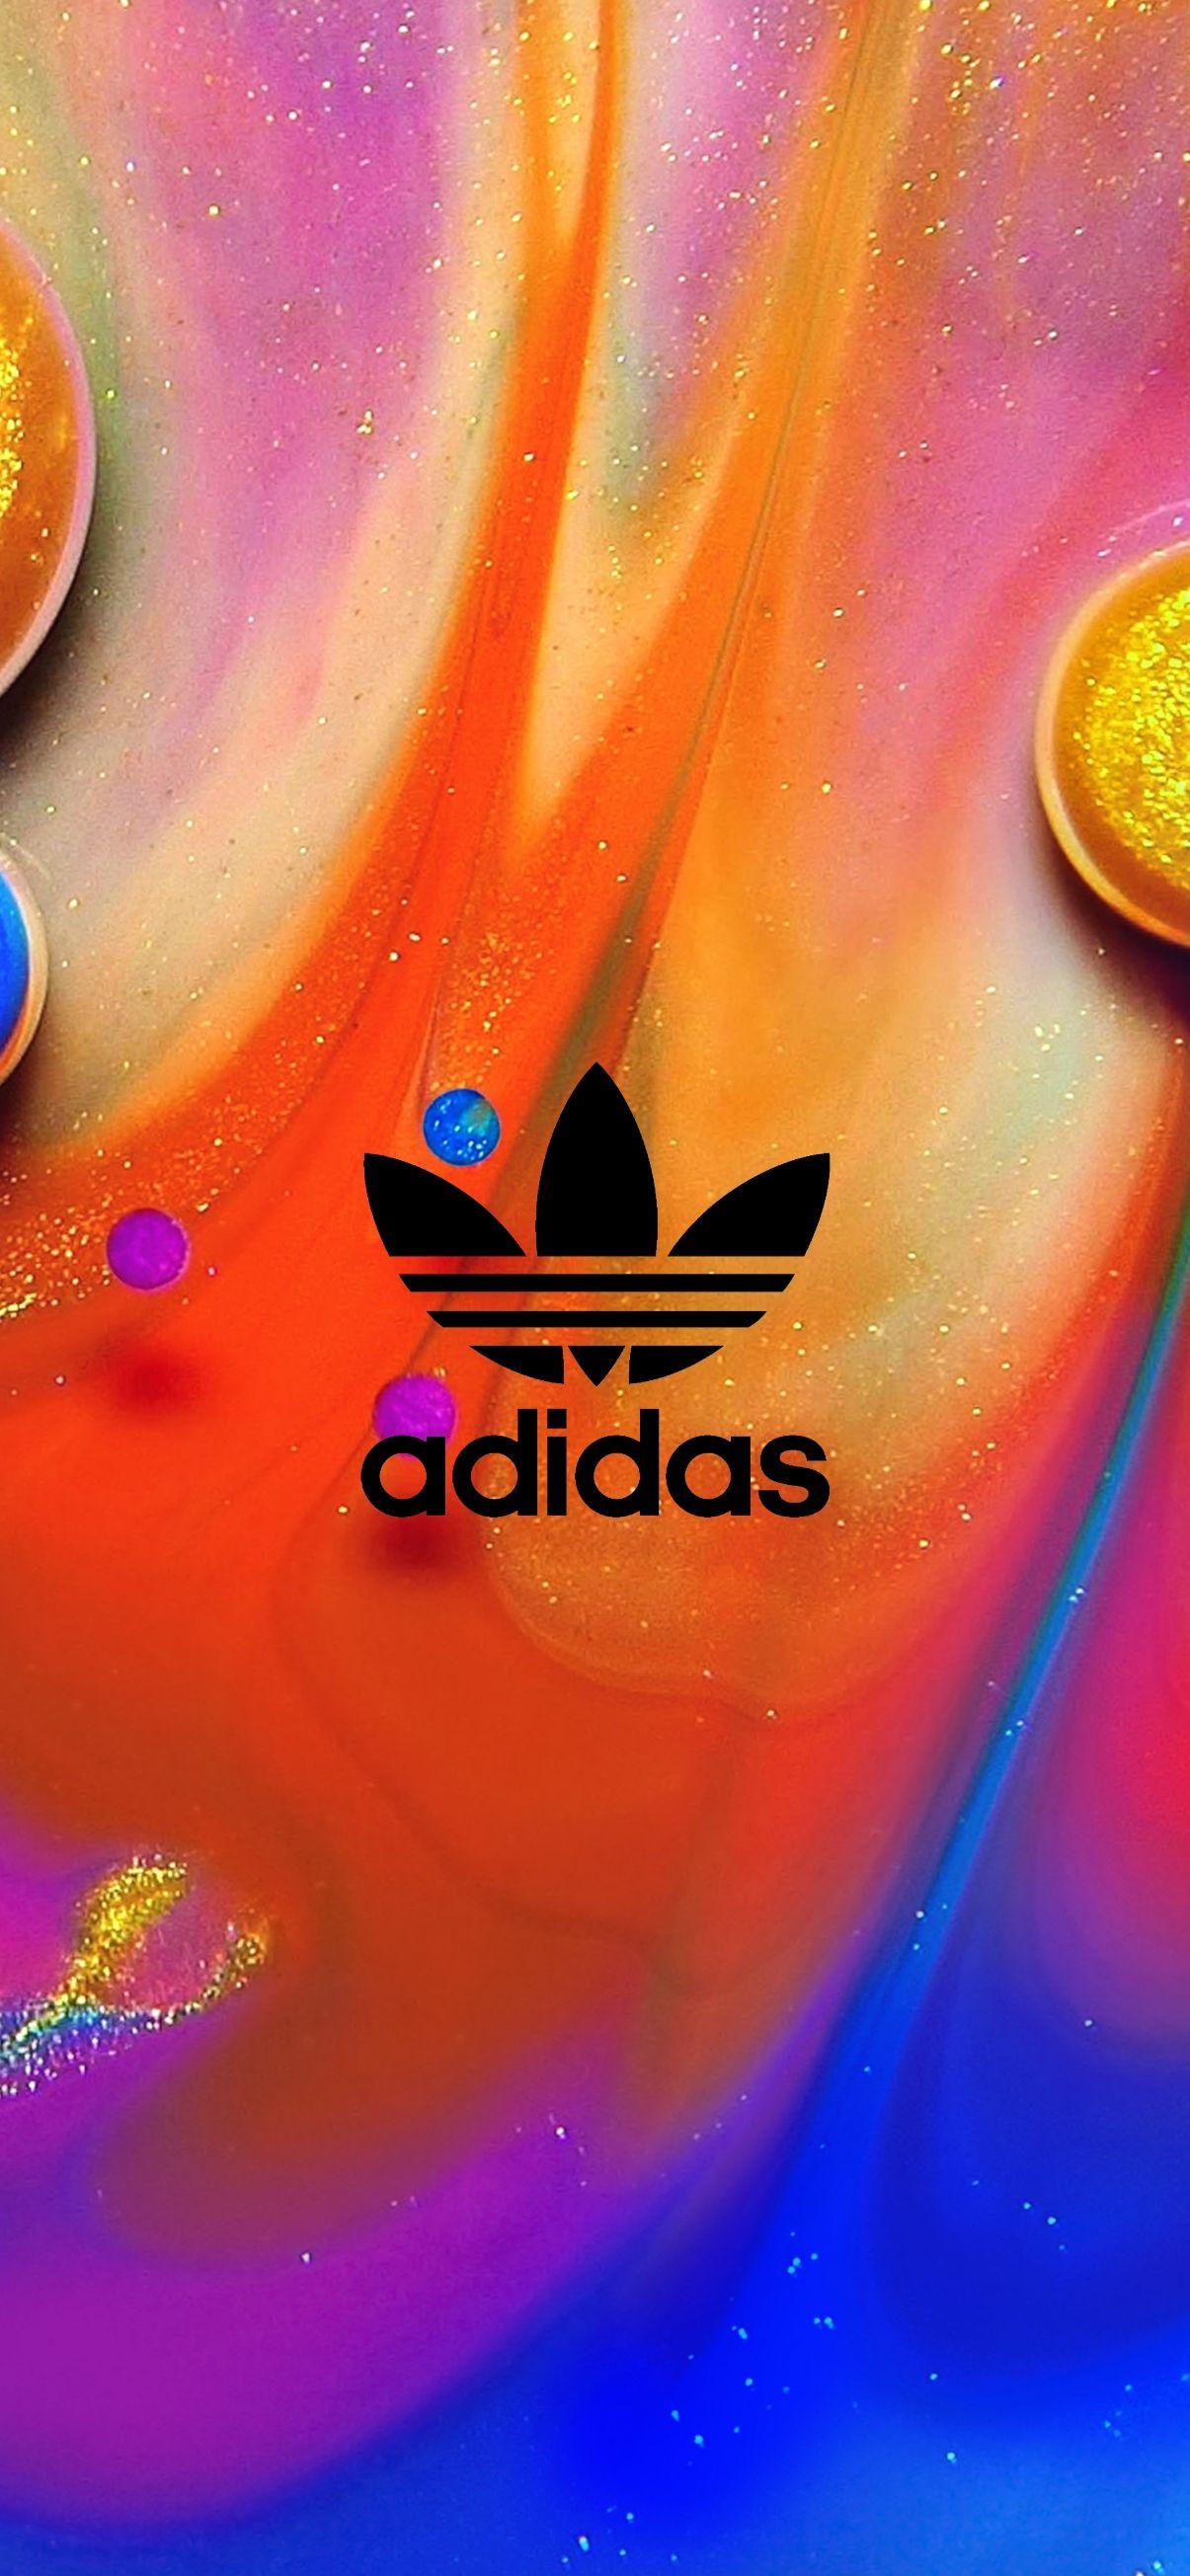 Adidas Logo Phone Wallpapers In 2020 Logo Wallpaper Hd Adidas Logo Wallpapers Adidas Wallpapers